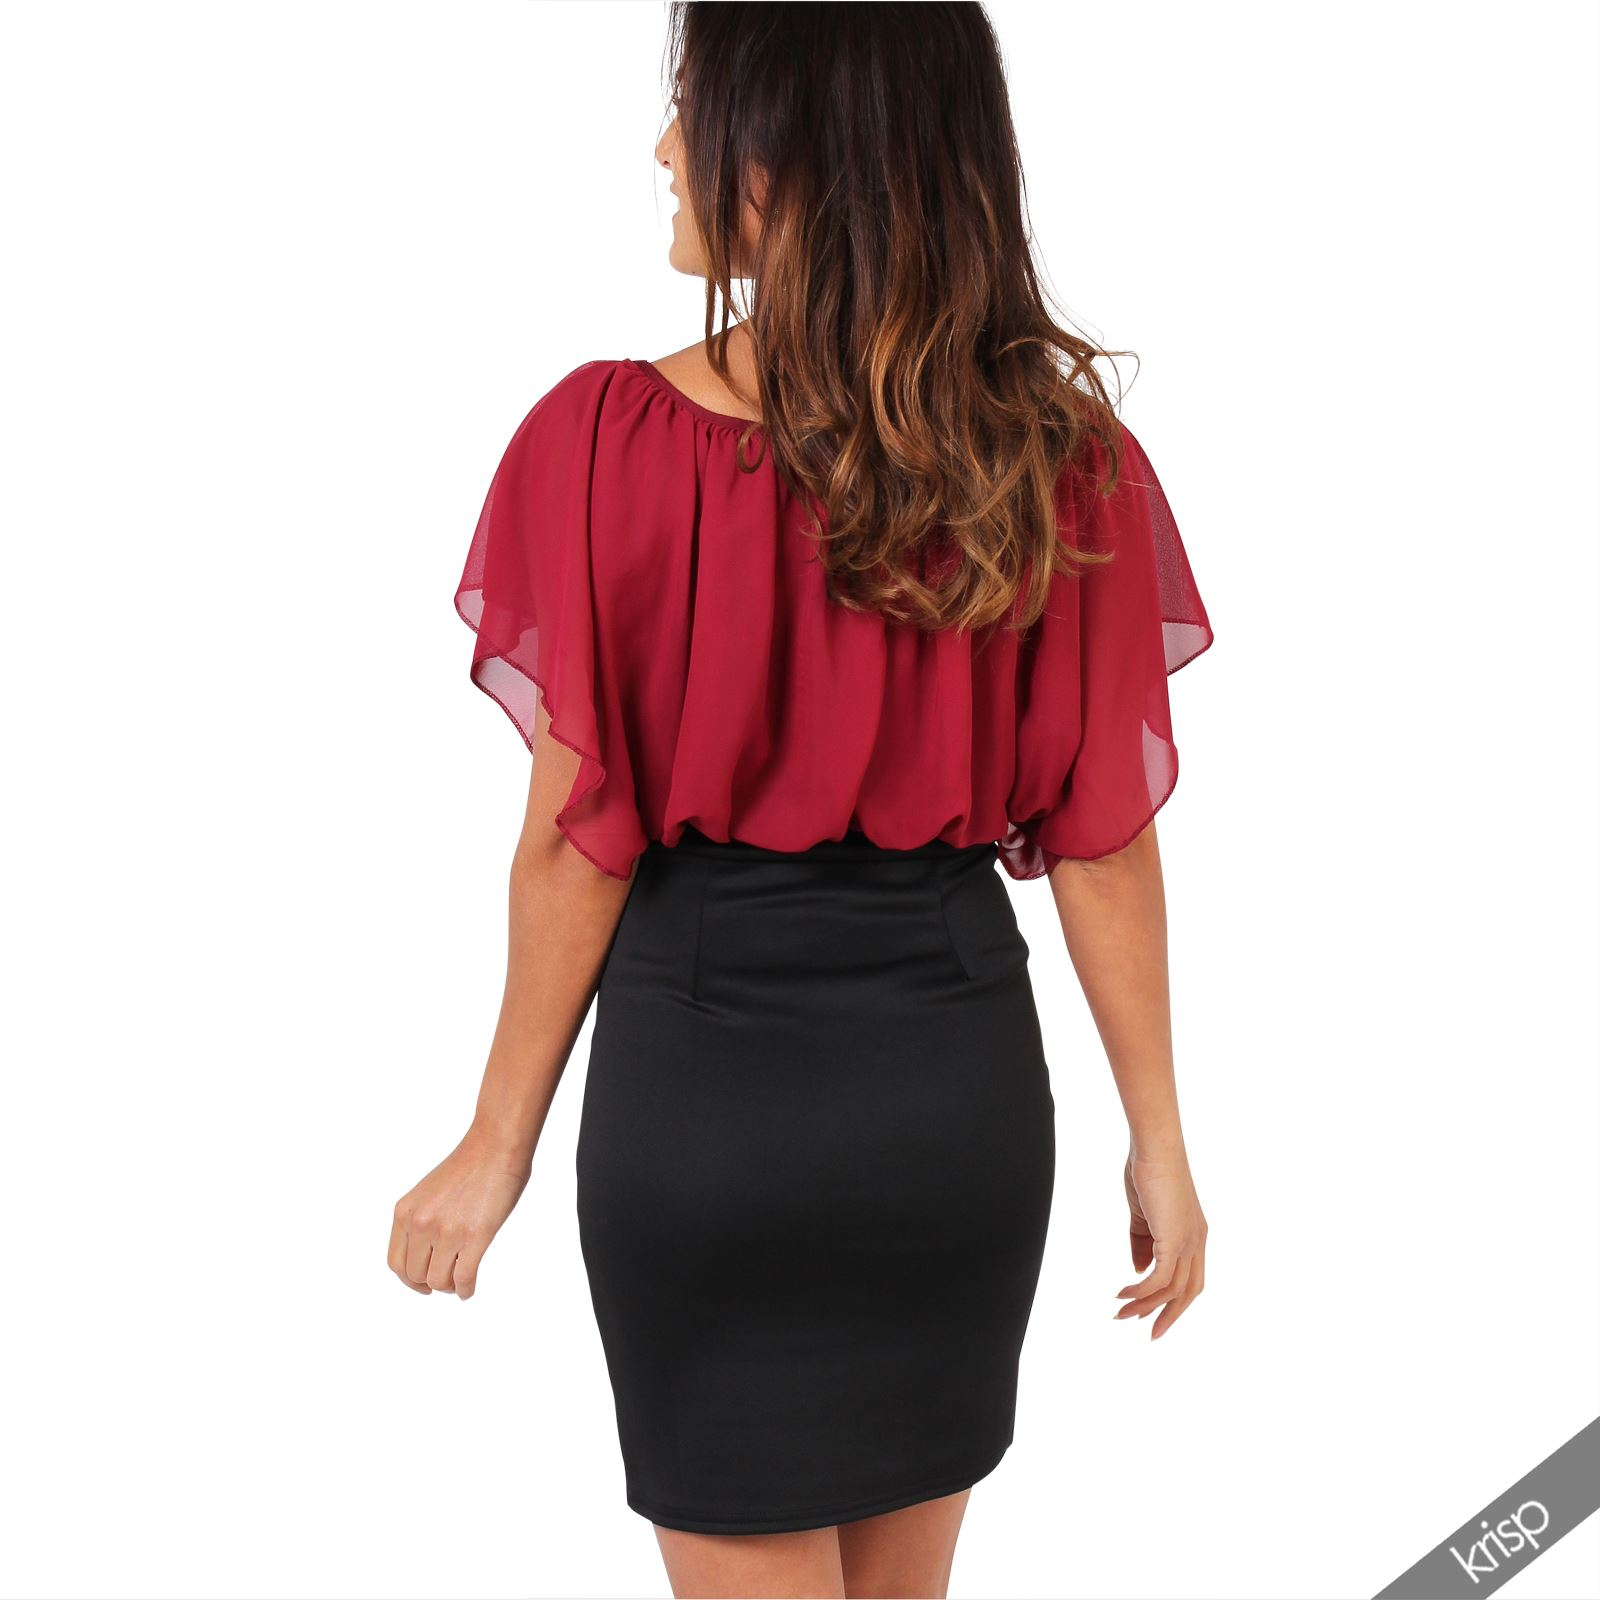 Womens-Pleated-Chiffon-Batwing-Top-High-Waist-Pencil-Bodycon-Skirt-Mini-Dress thumbnail 37